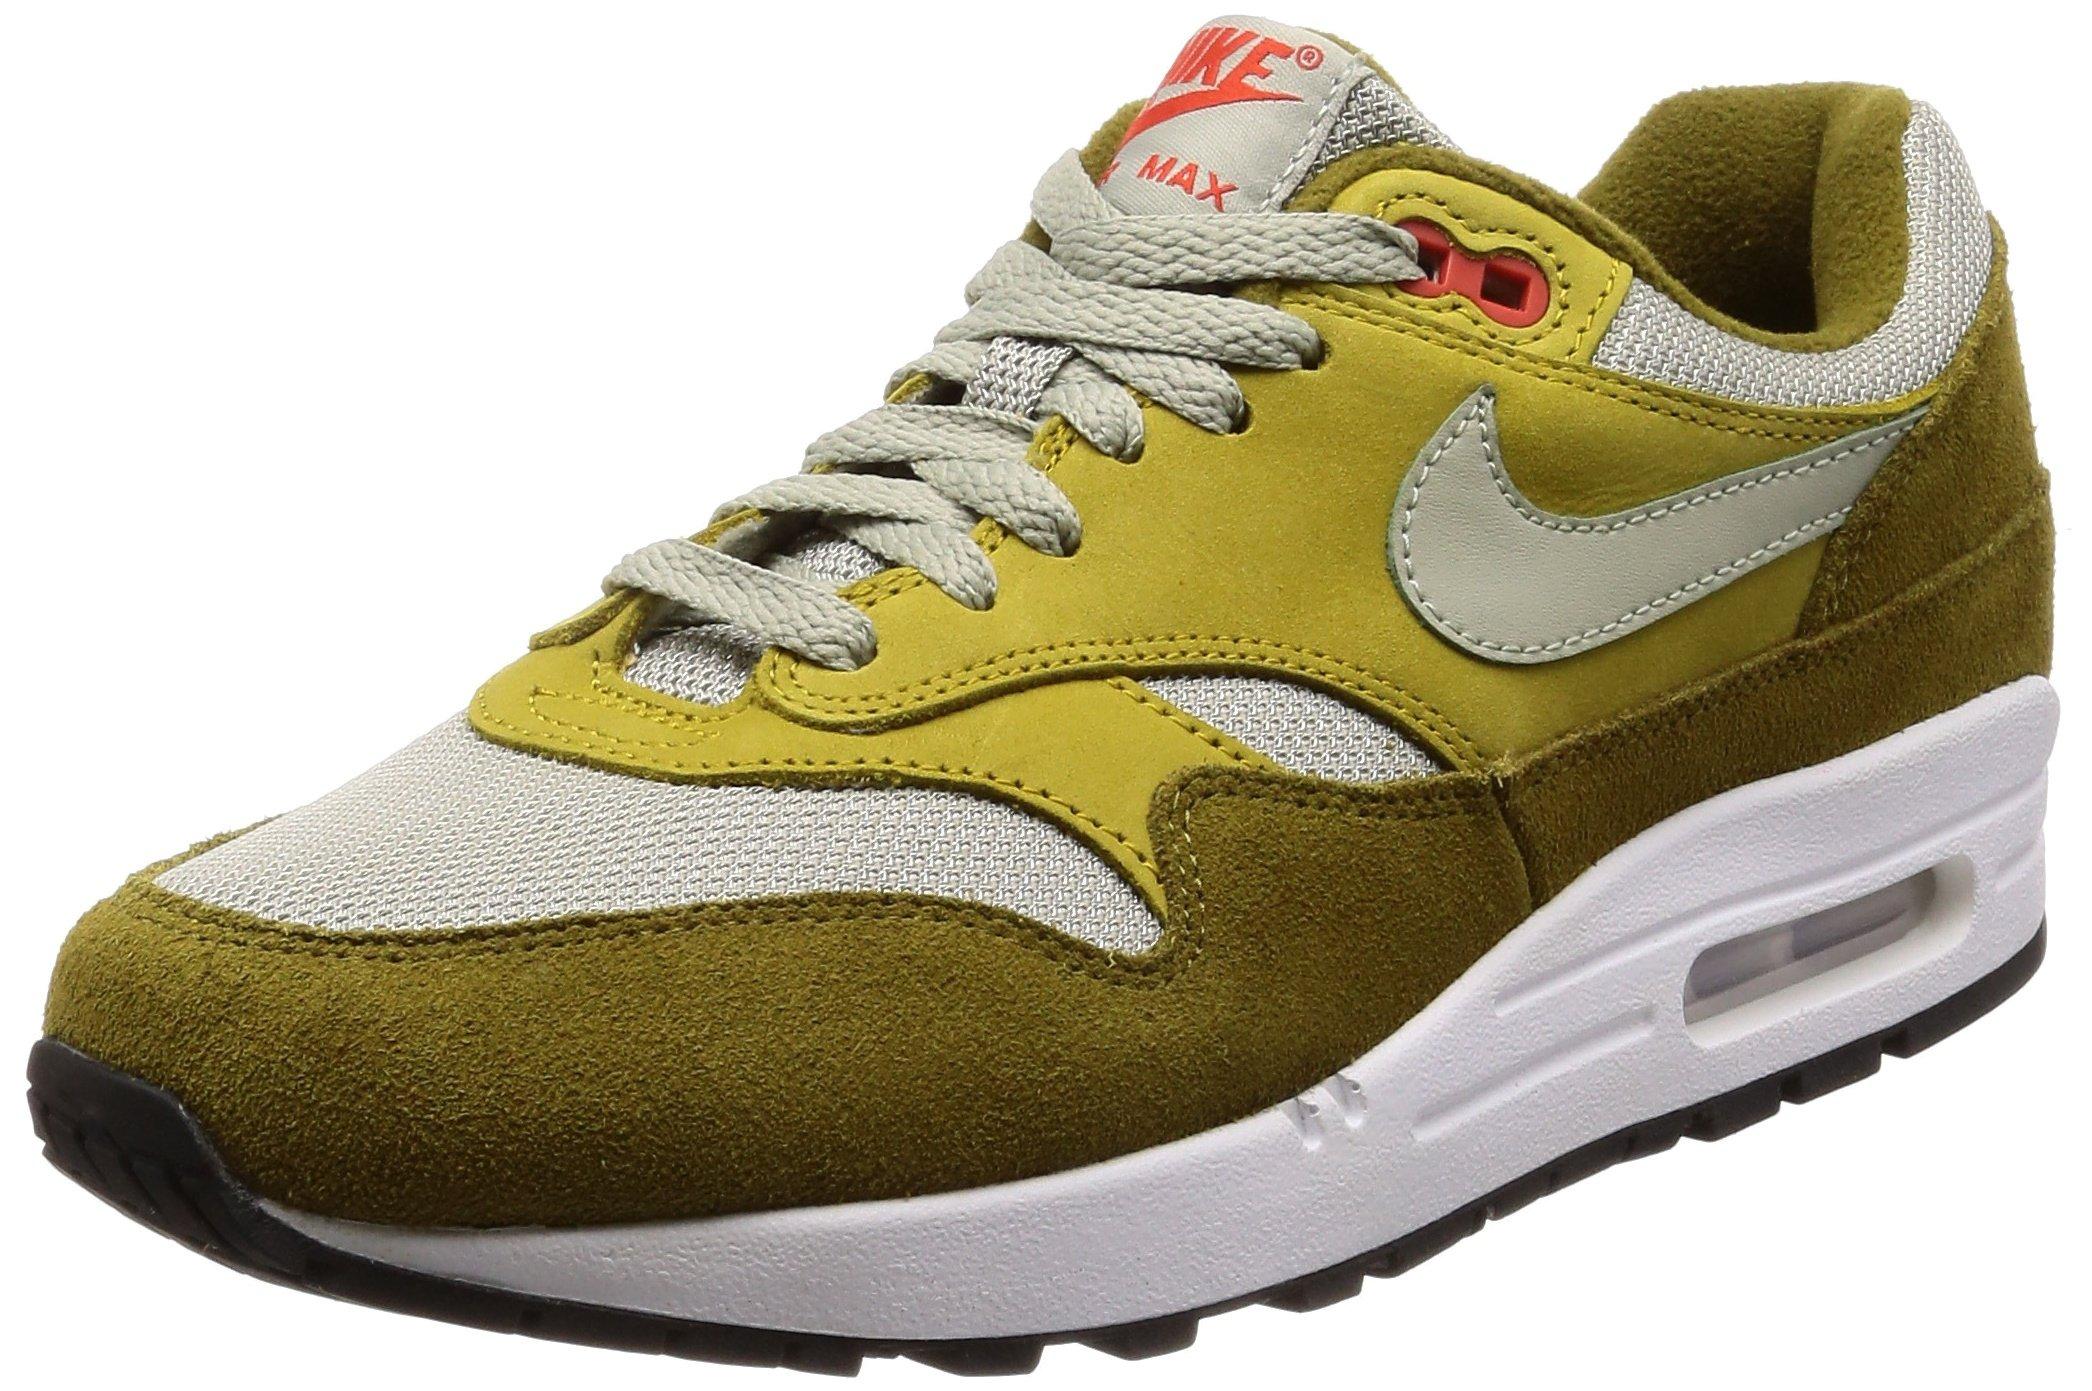 timeless design 78e3f a9544 Galleon - Nike Men s Air Max 1 Premium Retro Basketball Shoe (9)